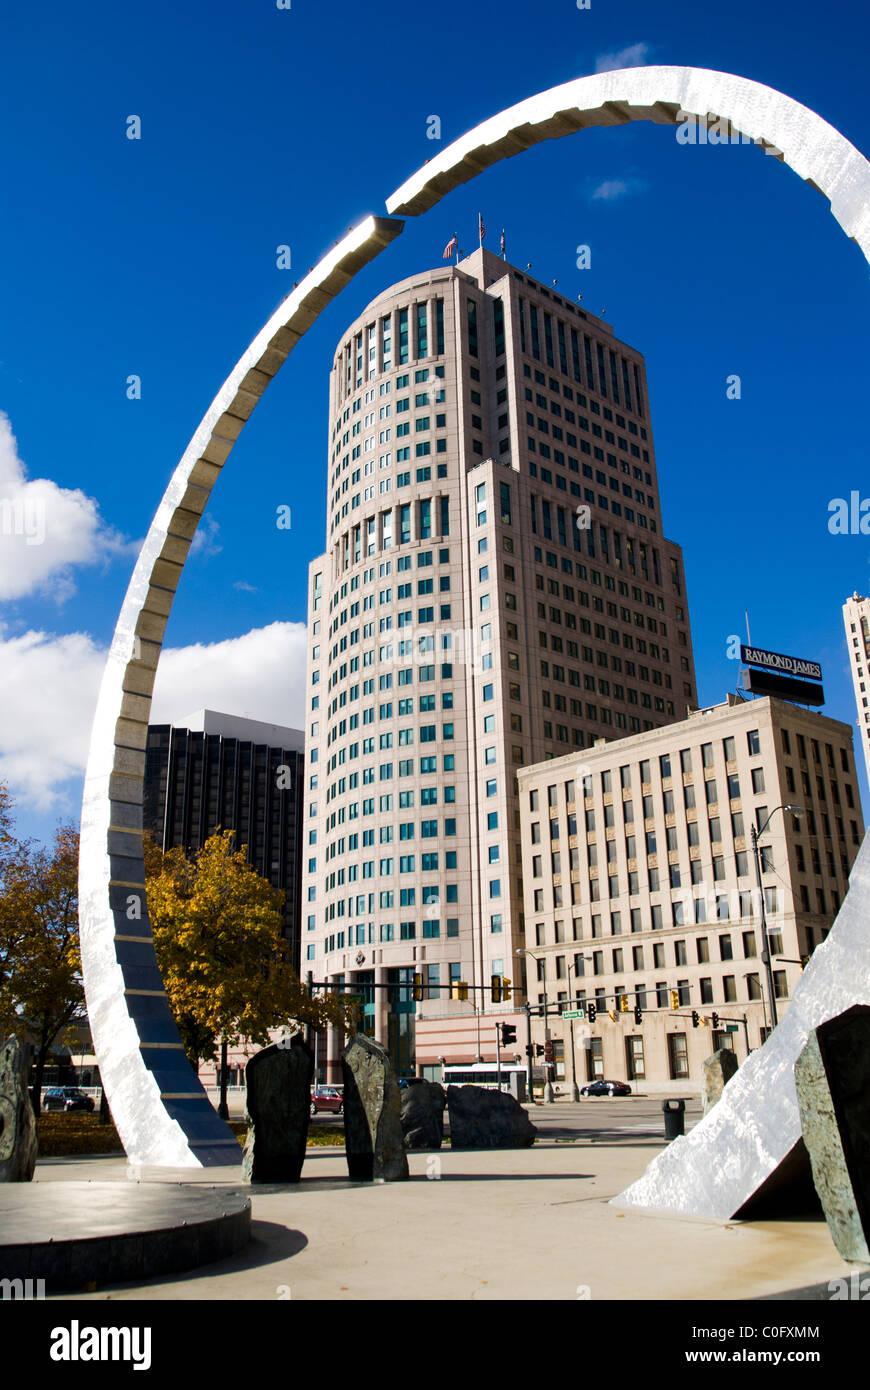 Michigan Labor Legacy Landmark, Hart Plaza, Detroit - Stock Image